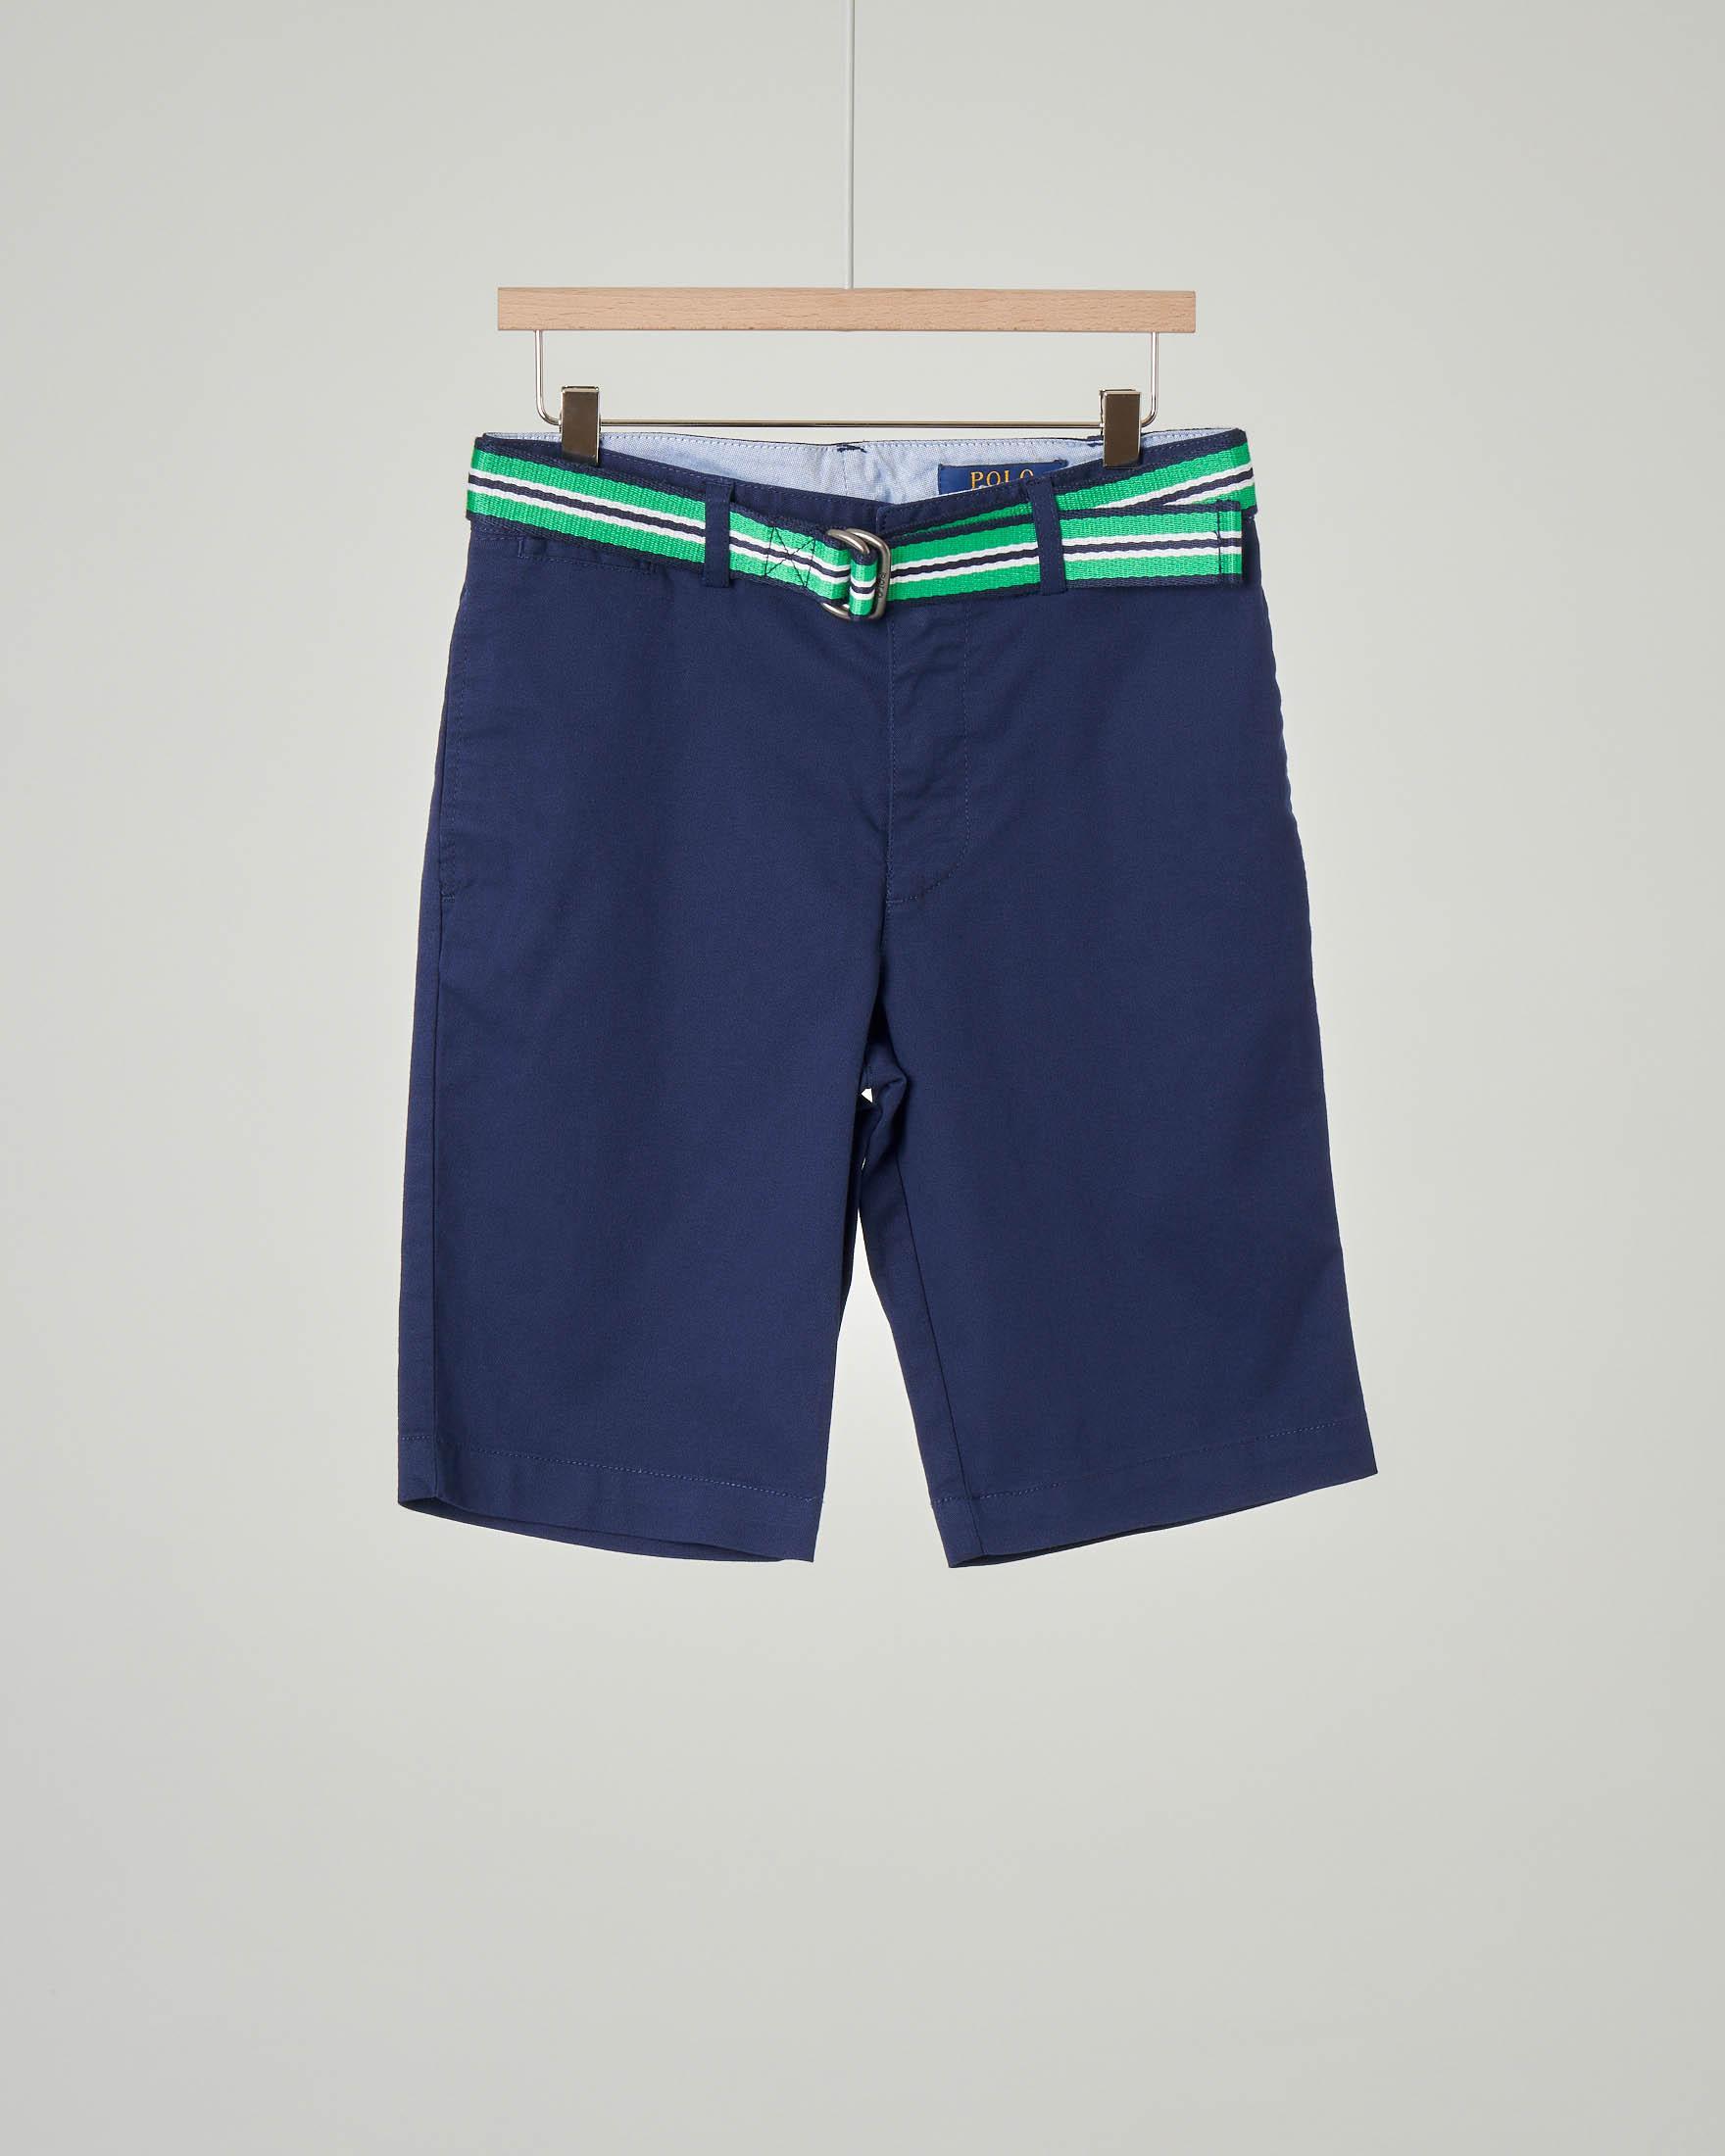 Bermuda chino blu con cintura